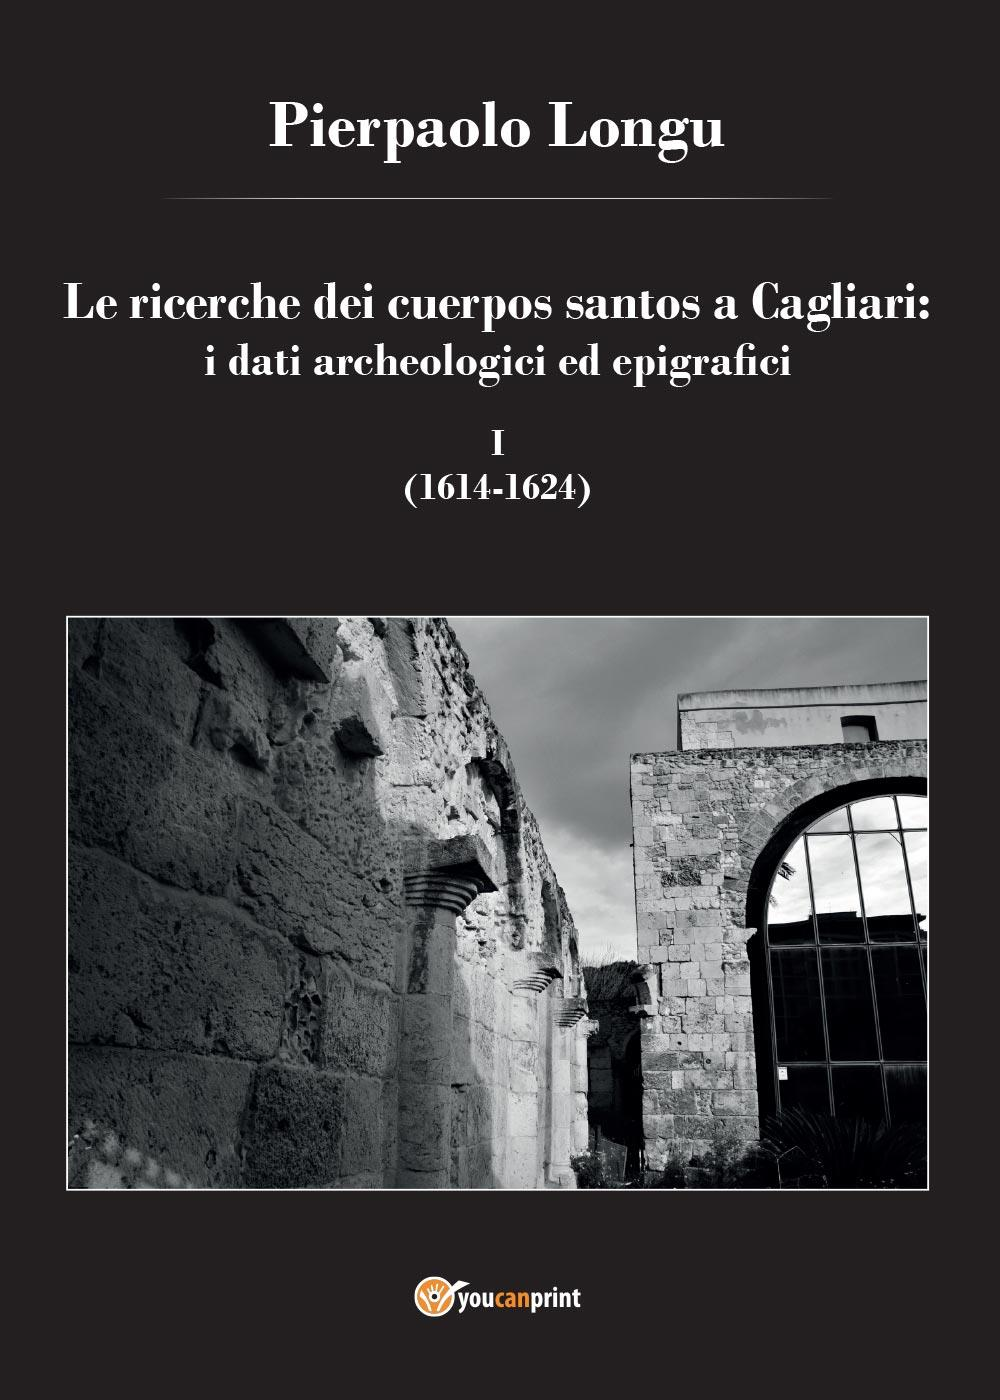 Le ricerche dei cuerpos santos a Cagliari: i dati archeologici ed epigrafici